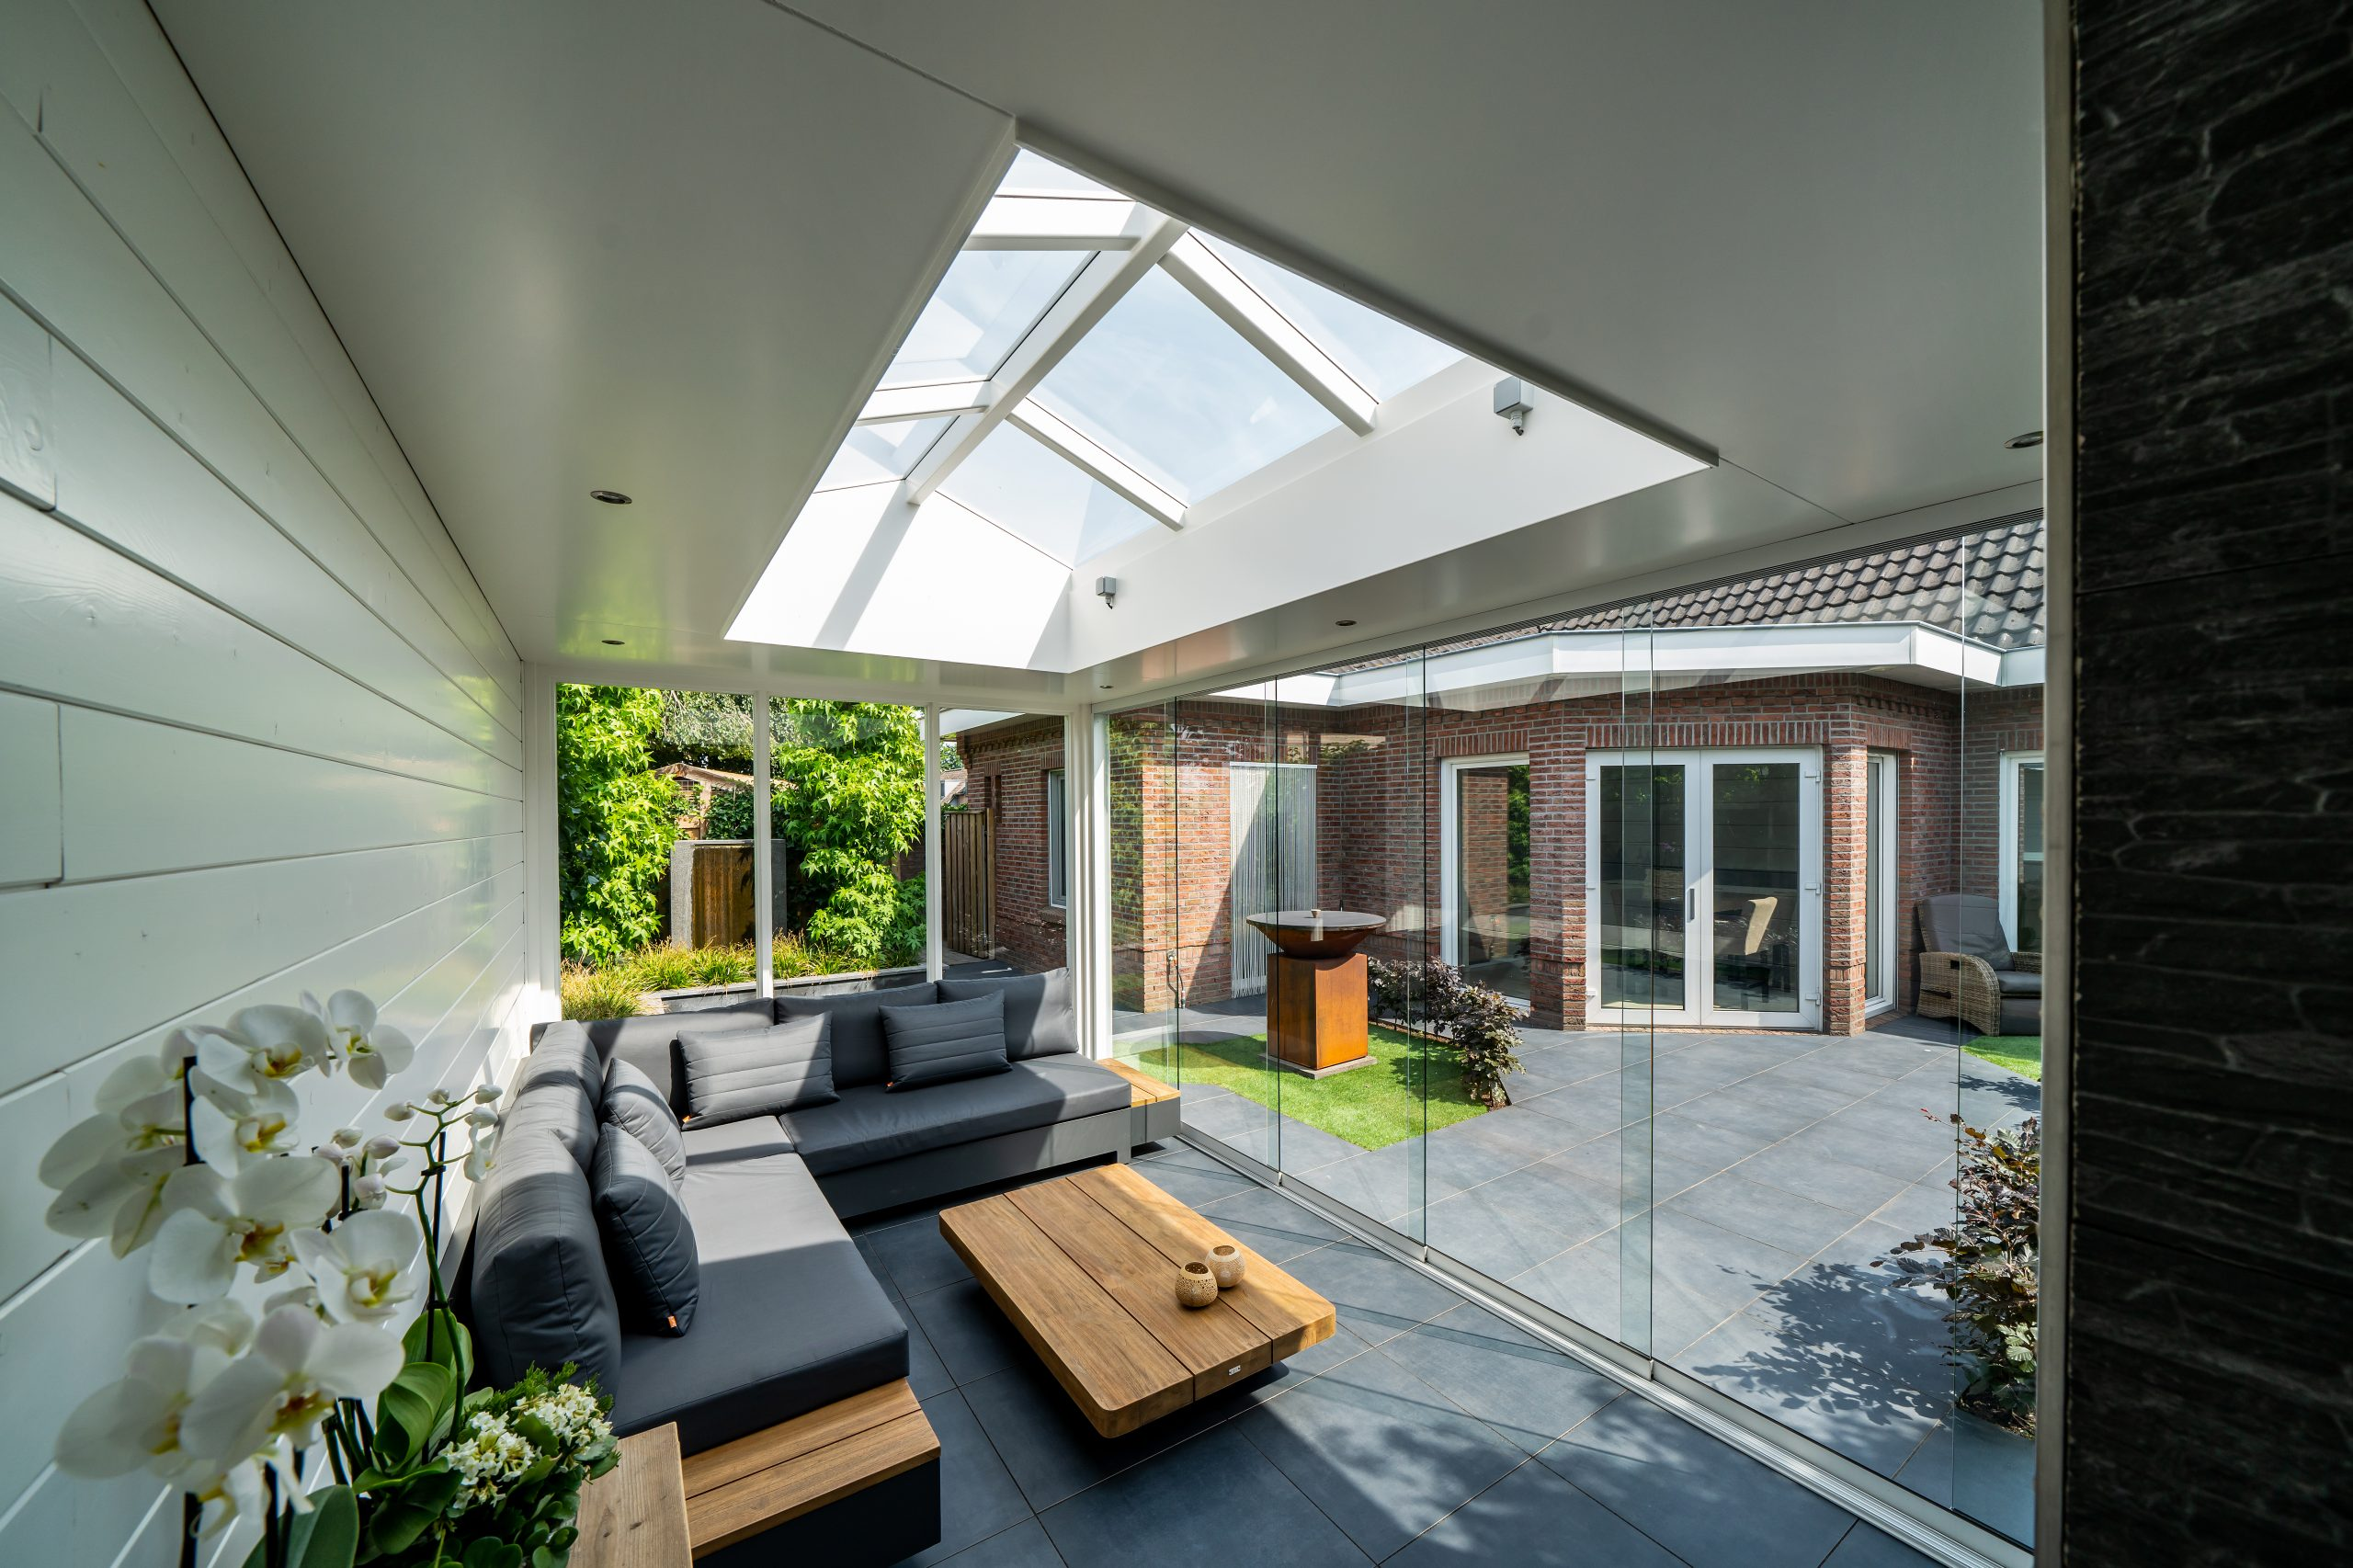 Tuinkamer van klassieke veranda met lichtstraat